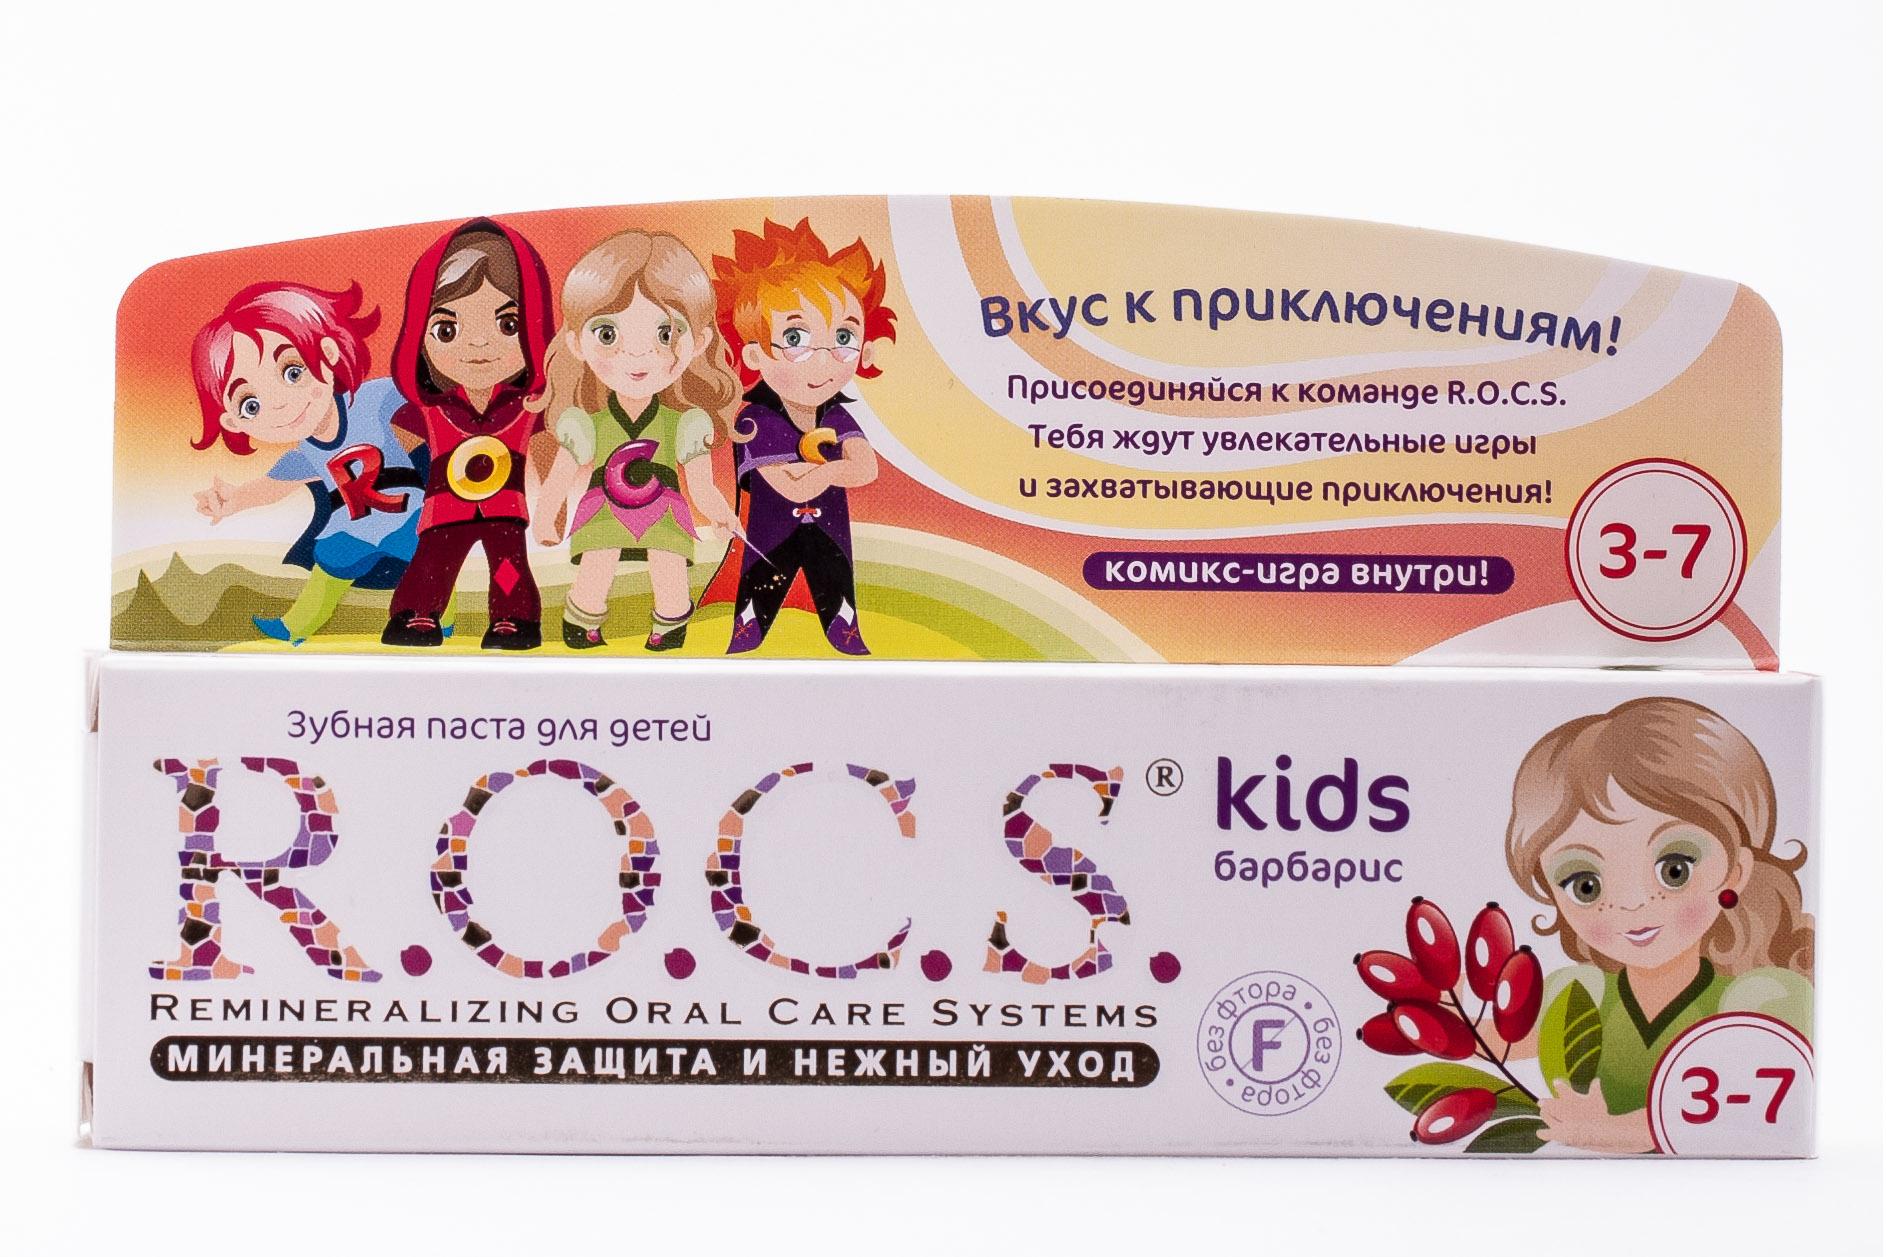 R.O.C.S Зубная паста Рокс для детей Барбарис со вкусом барбариса 45 гр. (Kids 3-7 years)